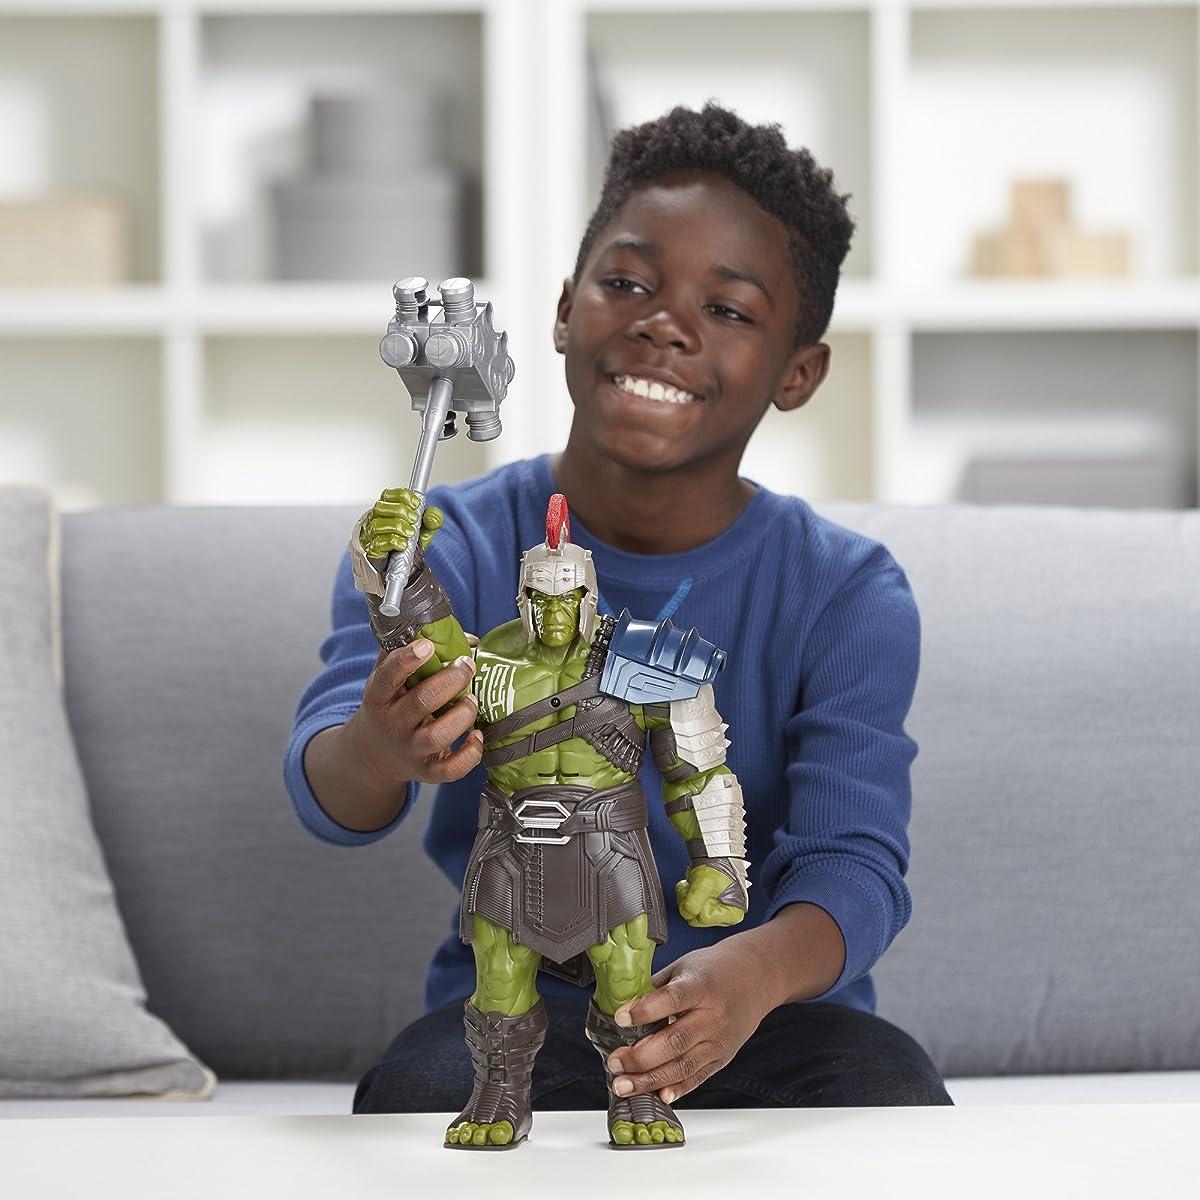 Marvel Thor: Ragnarok Interactive Gladiator Hulk